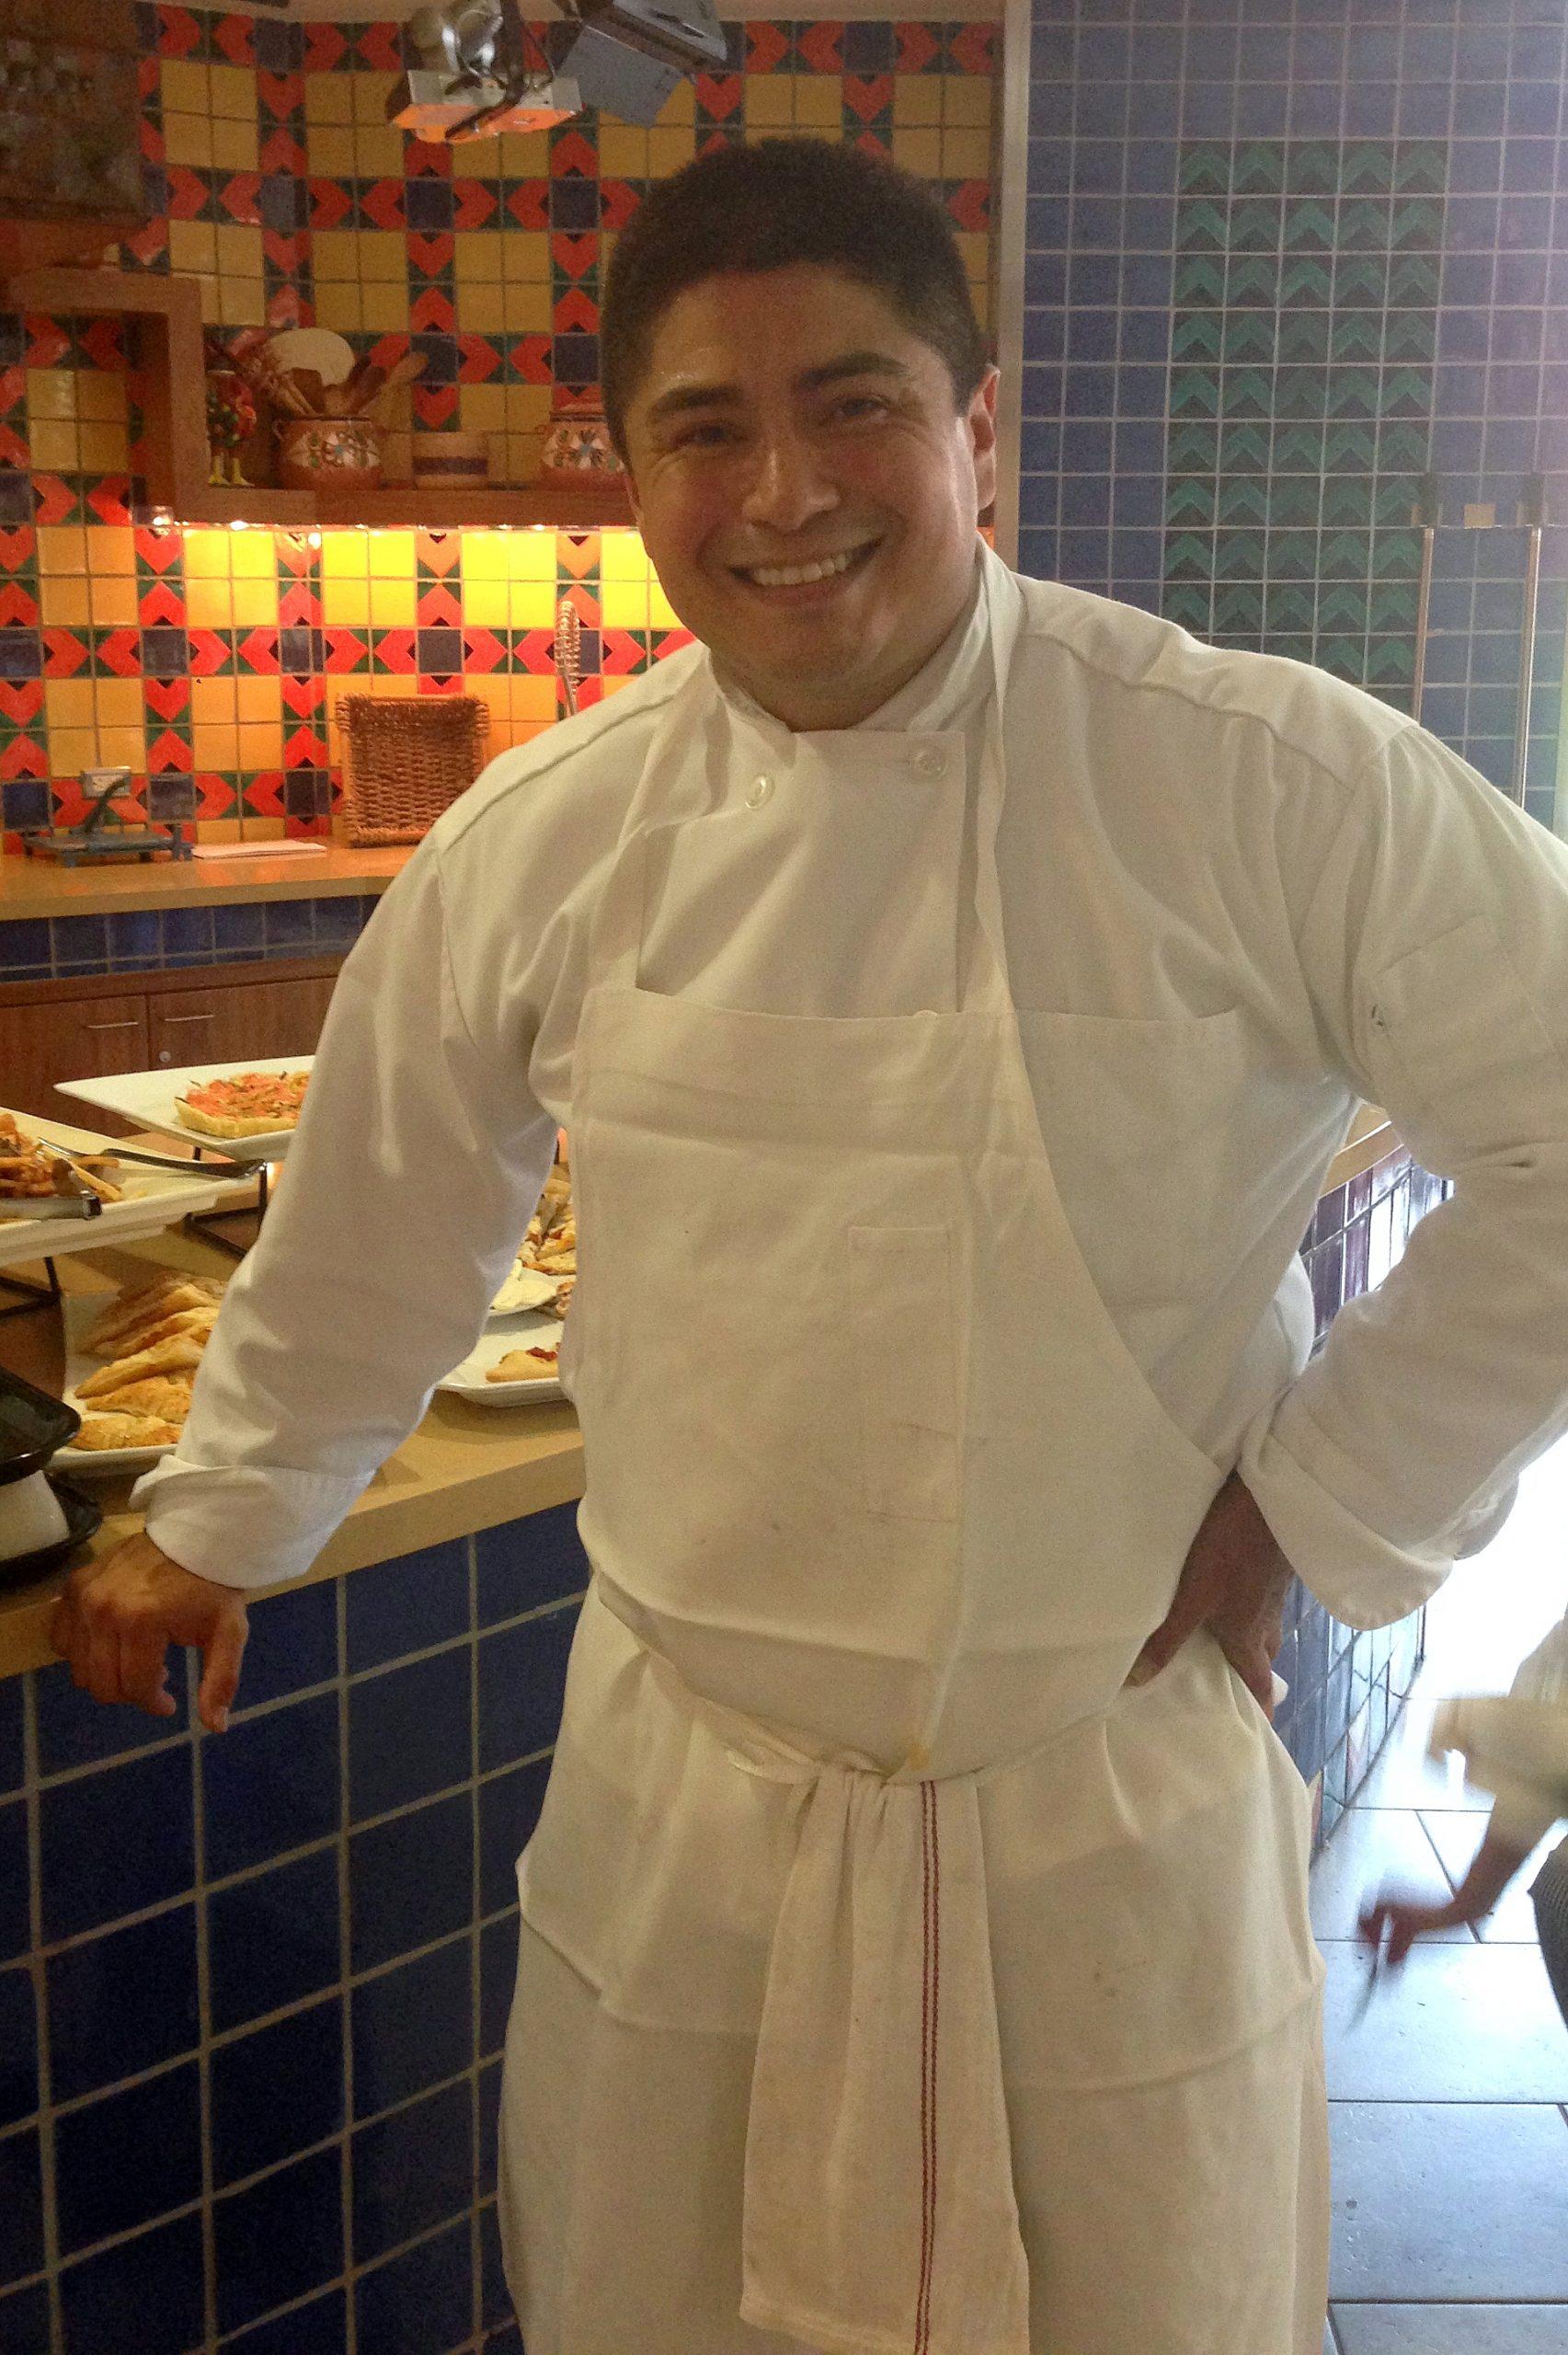 Chef Joe is part of the Warriors to Work program